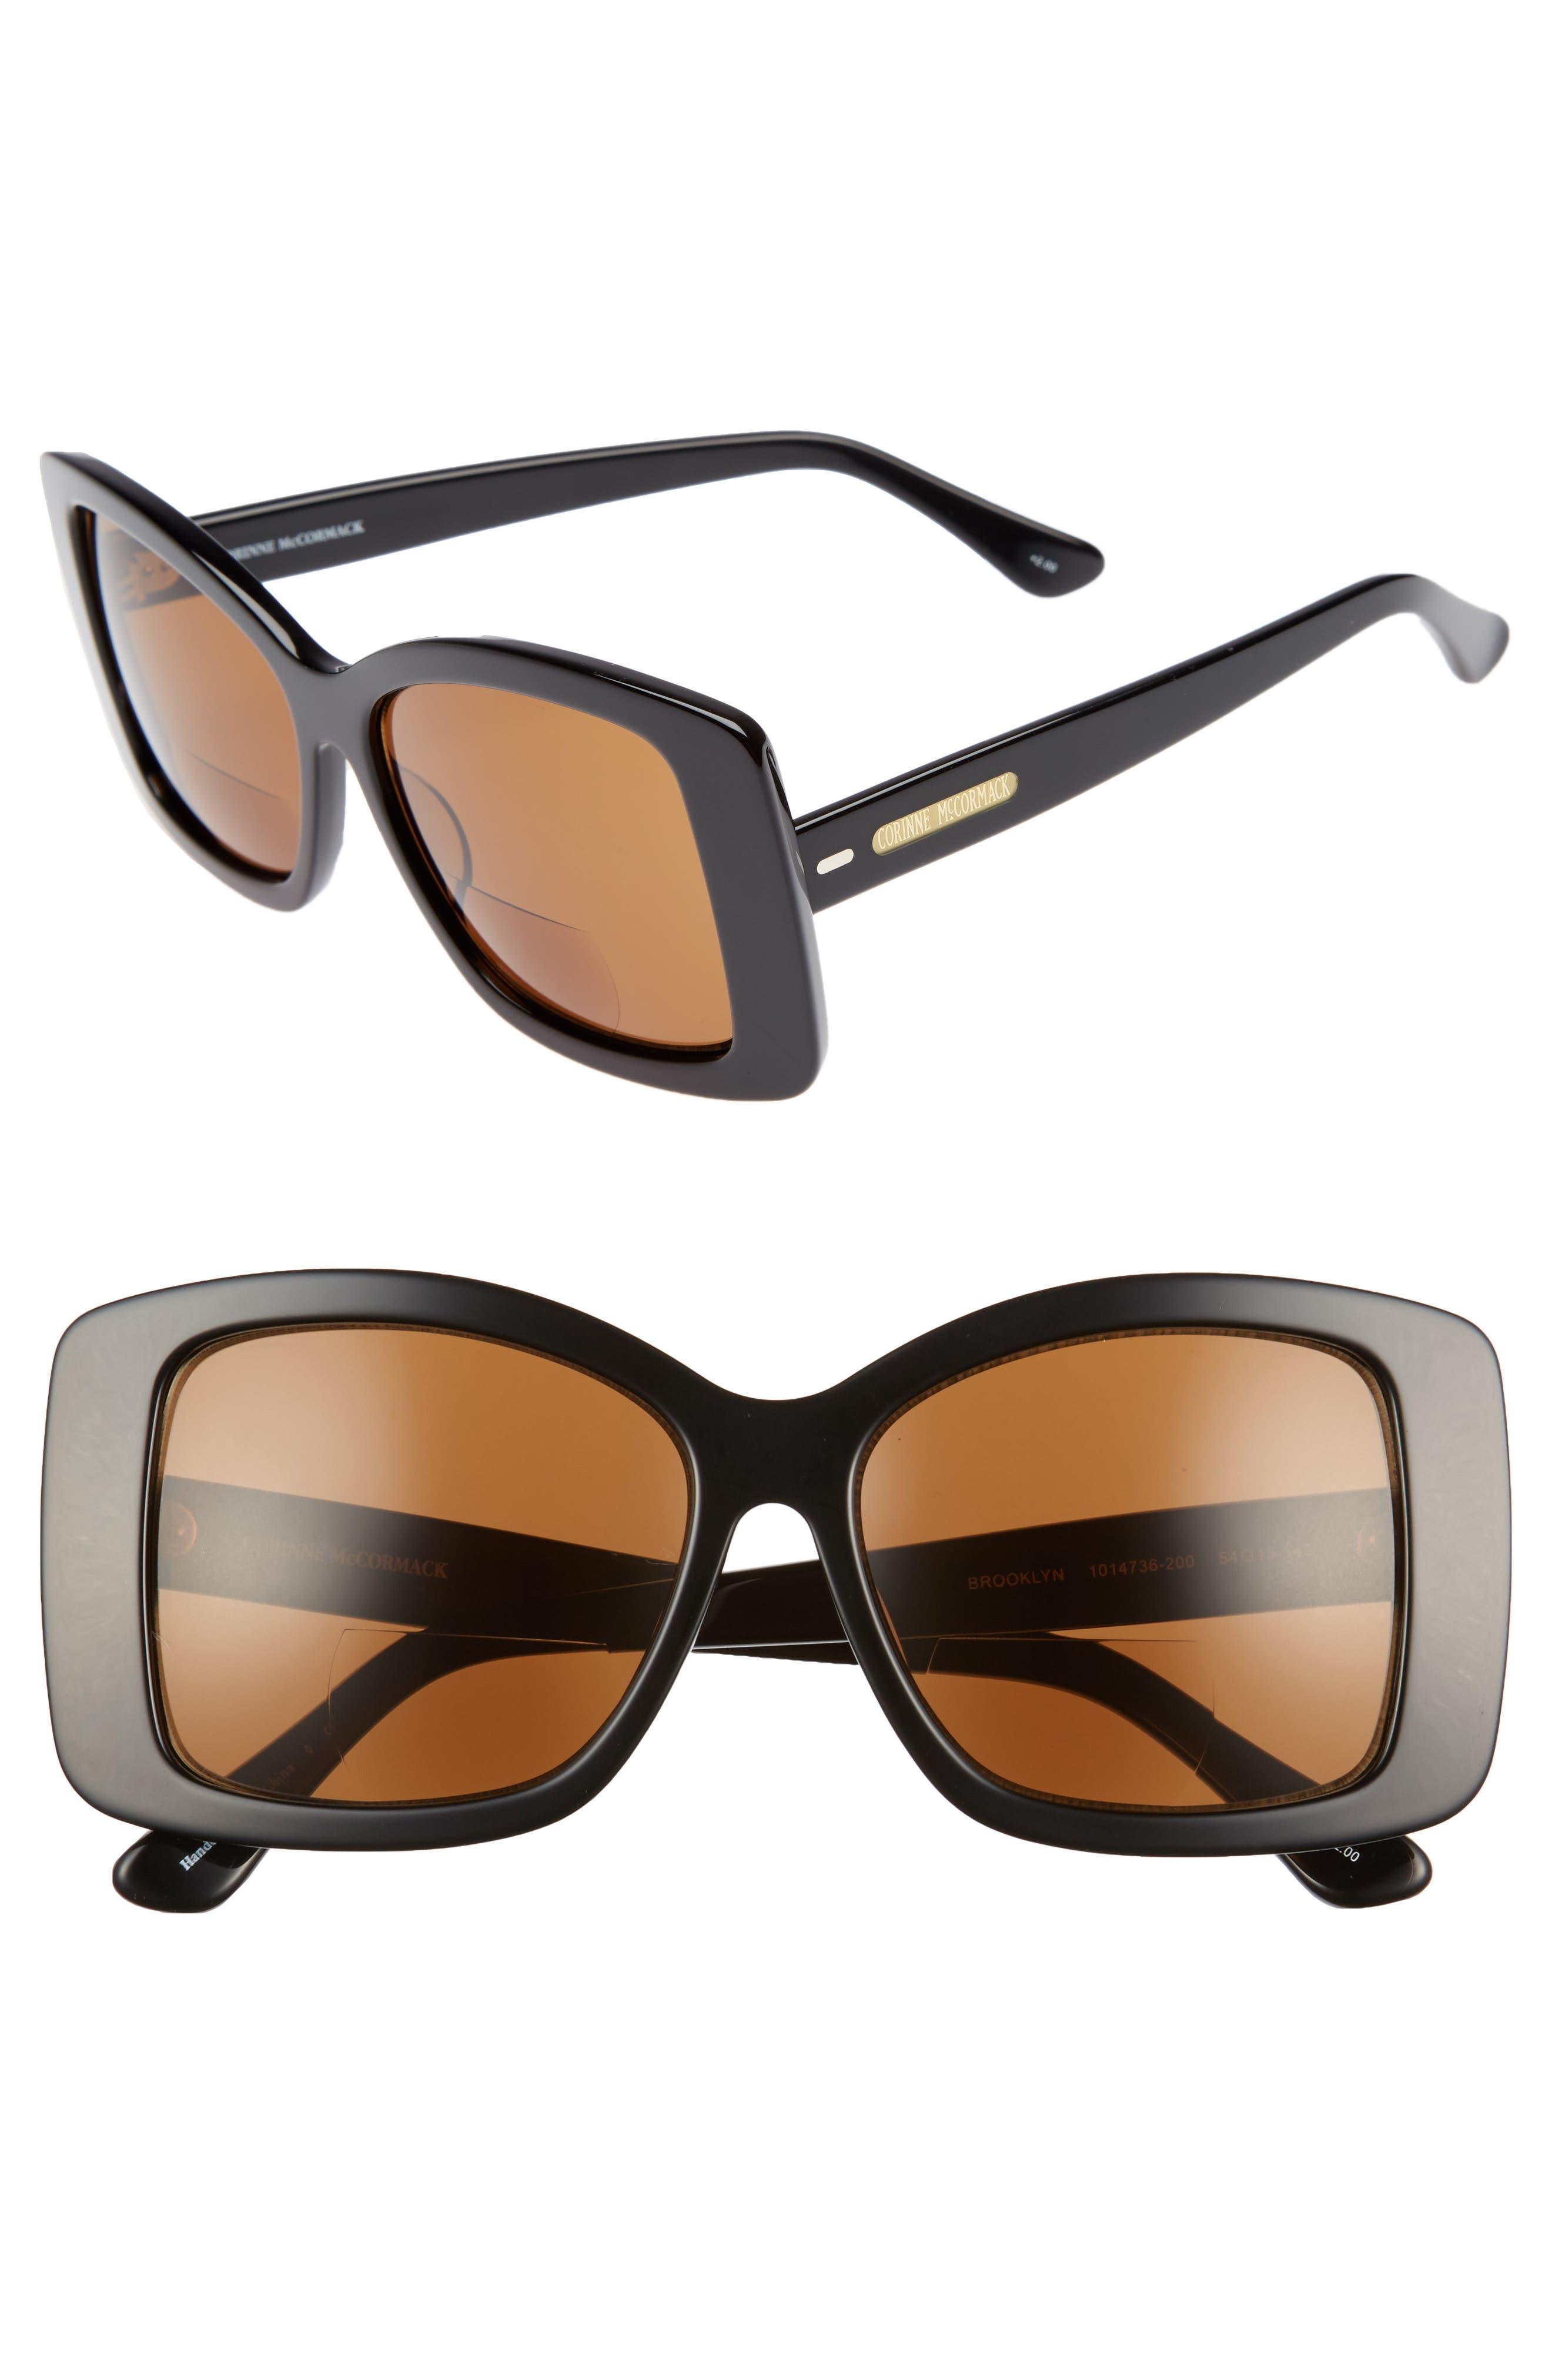 Brooklyn 54mm Reading Sunglasses,                             Main thumbnail 1, color,                             001